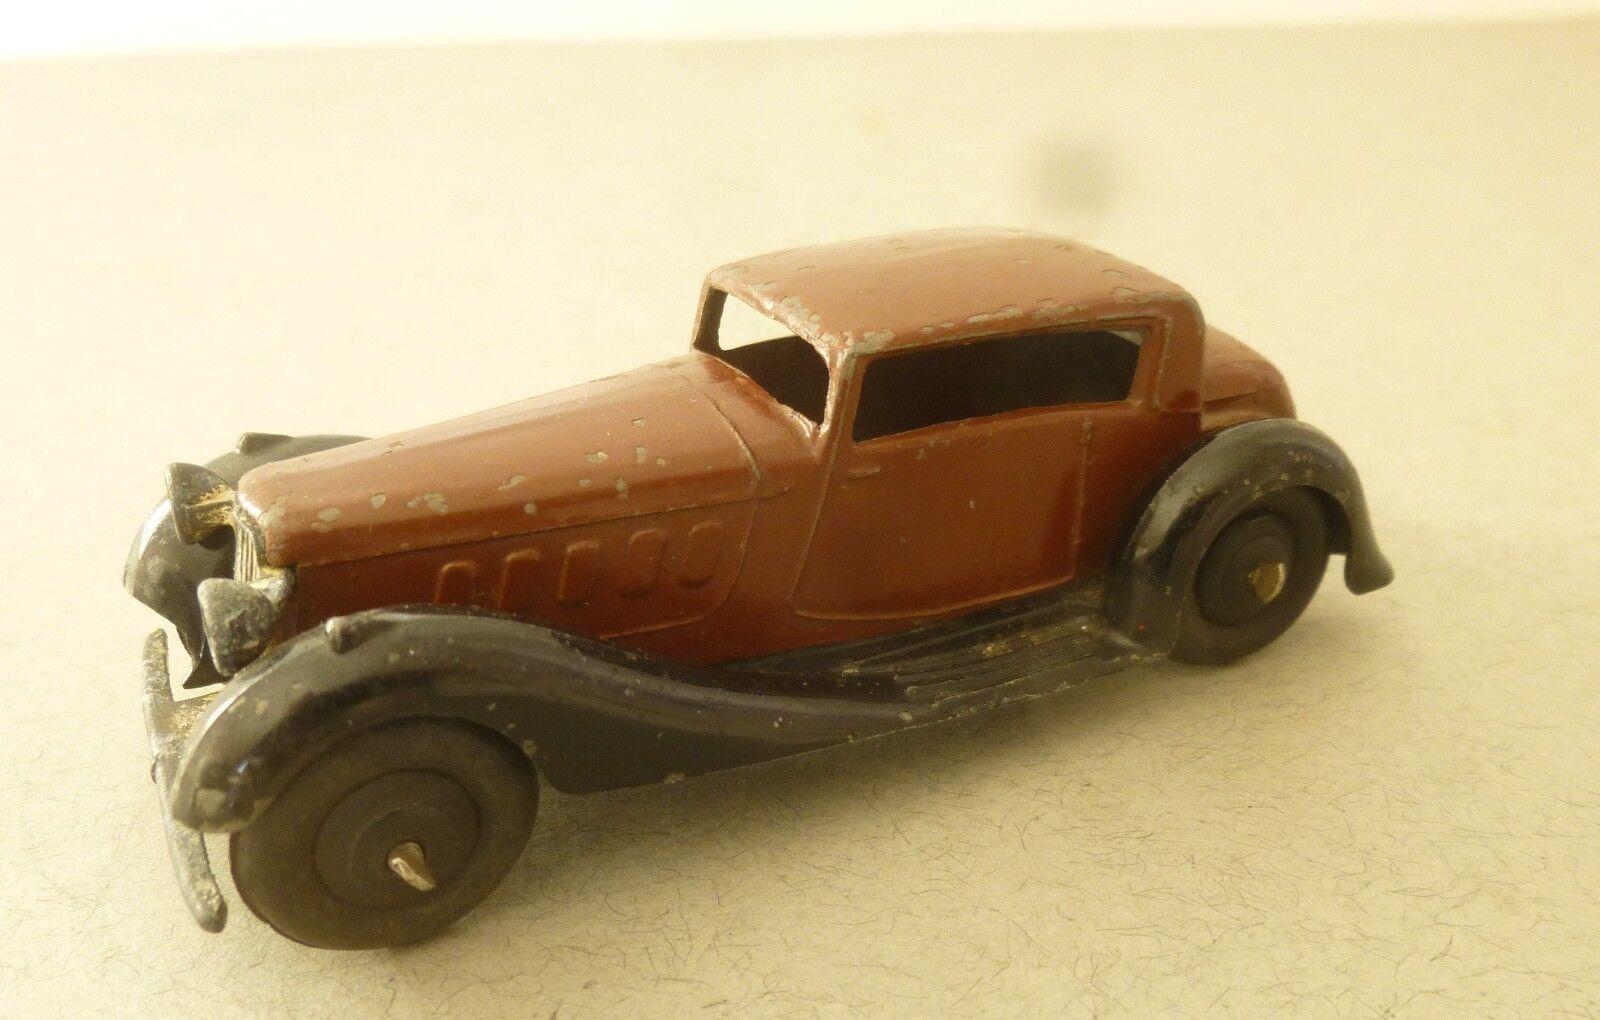 Dinky Toys versión temprana Humber Vogue Saloon Coche 1940s Dinky Toy